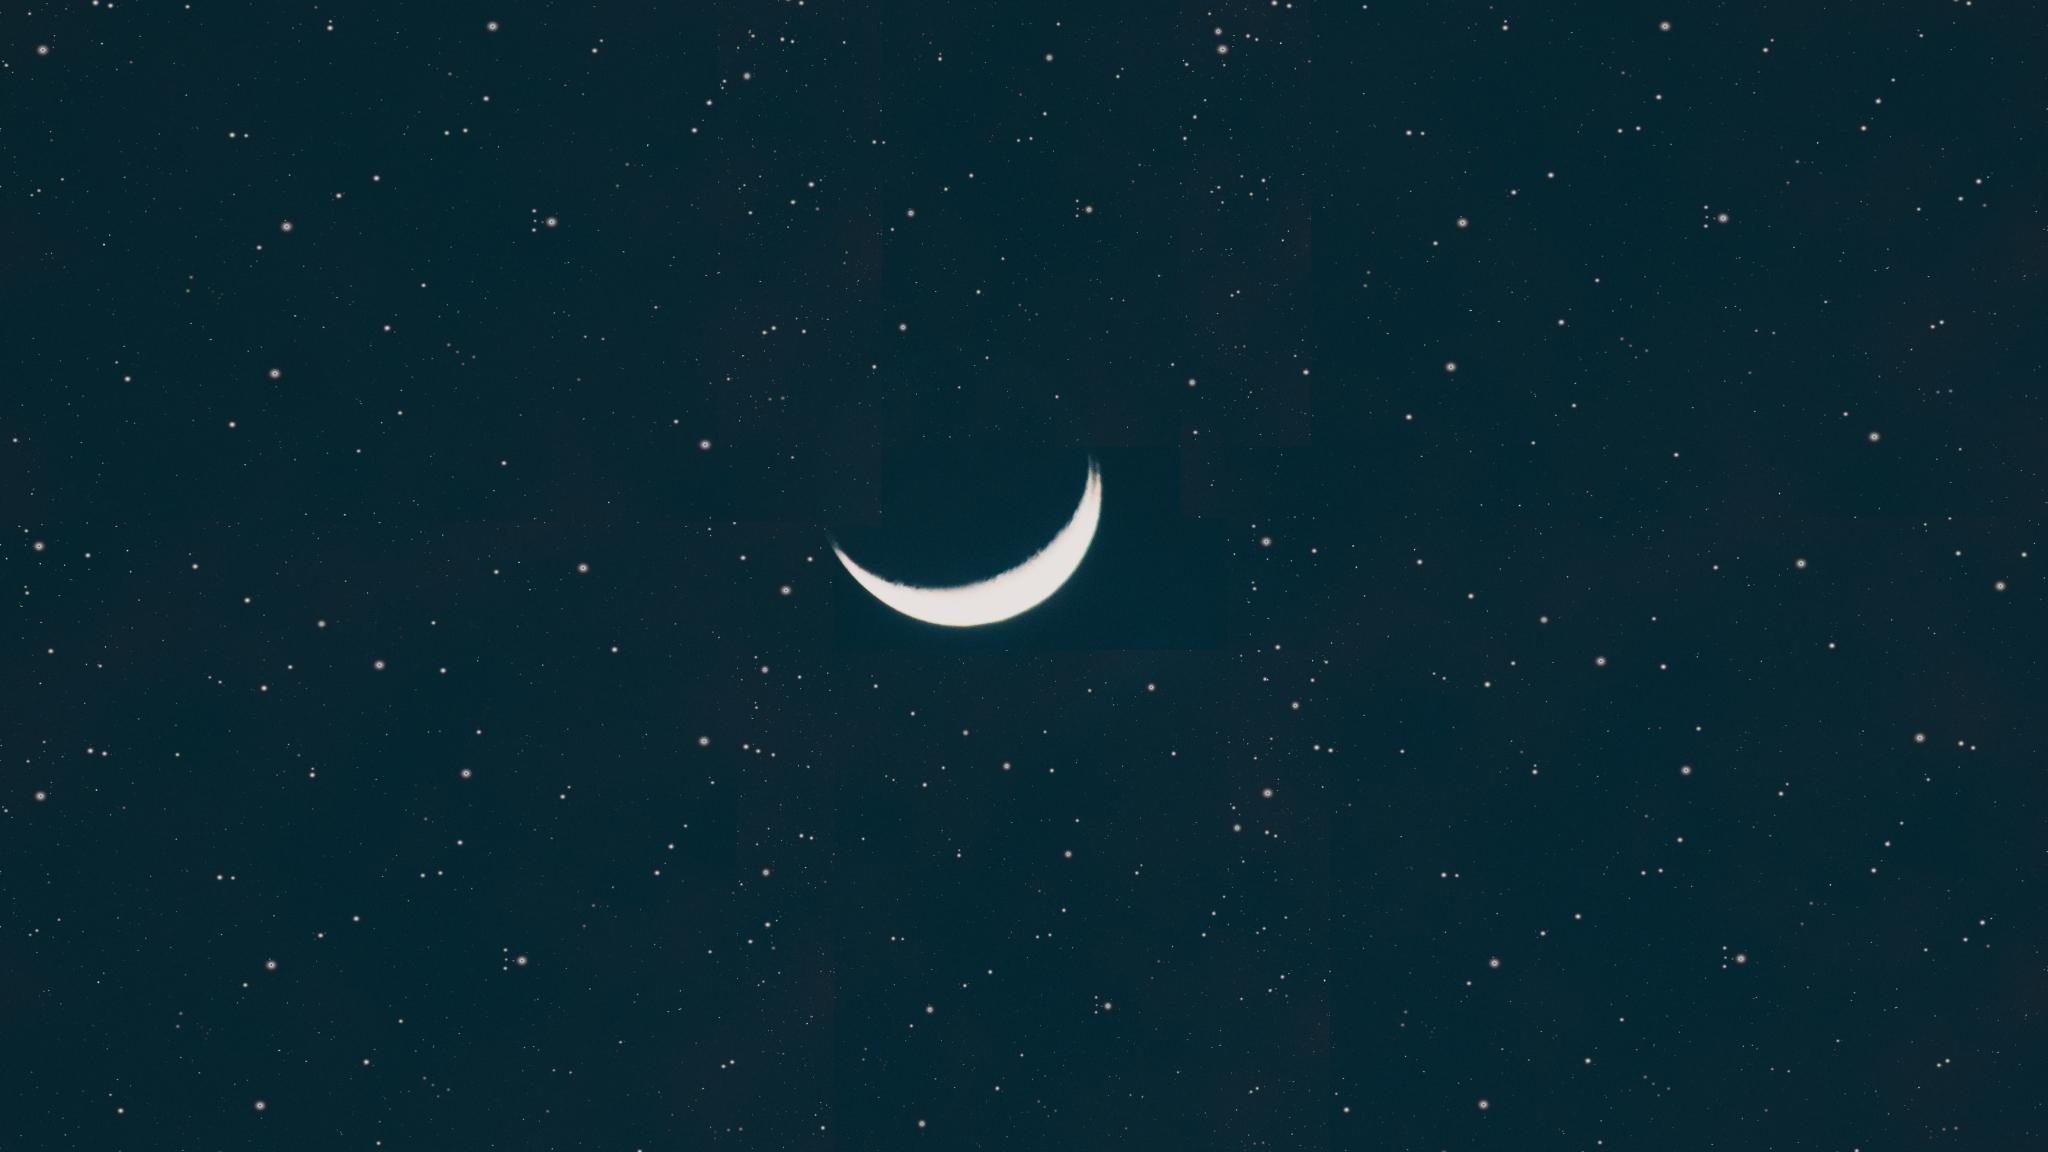 2048x1152 Half Moon 2048x1152 Resolution Wallpaper Hd